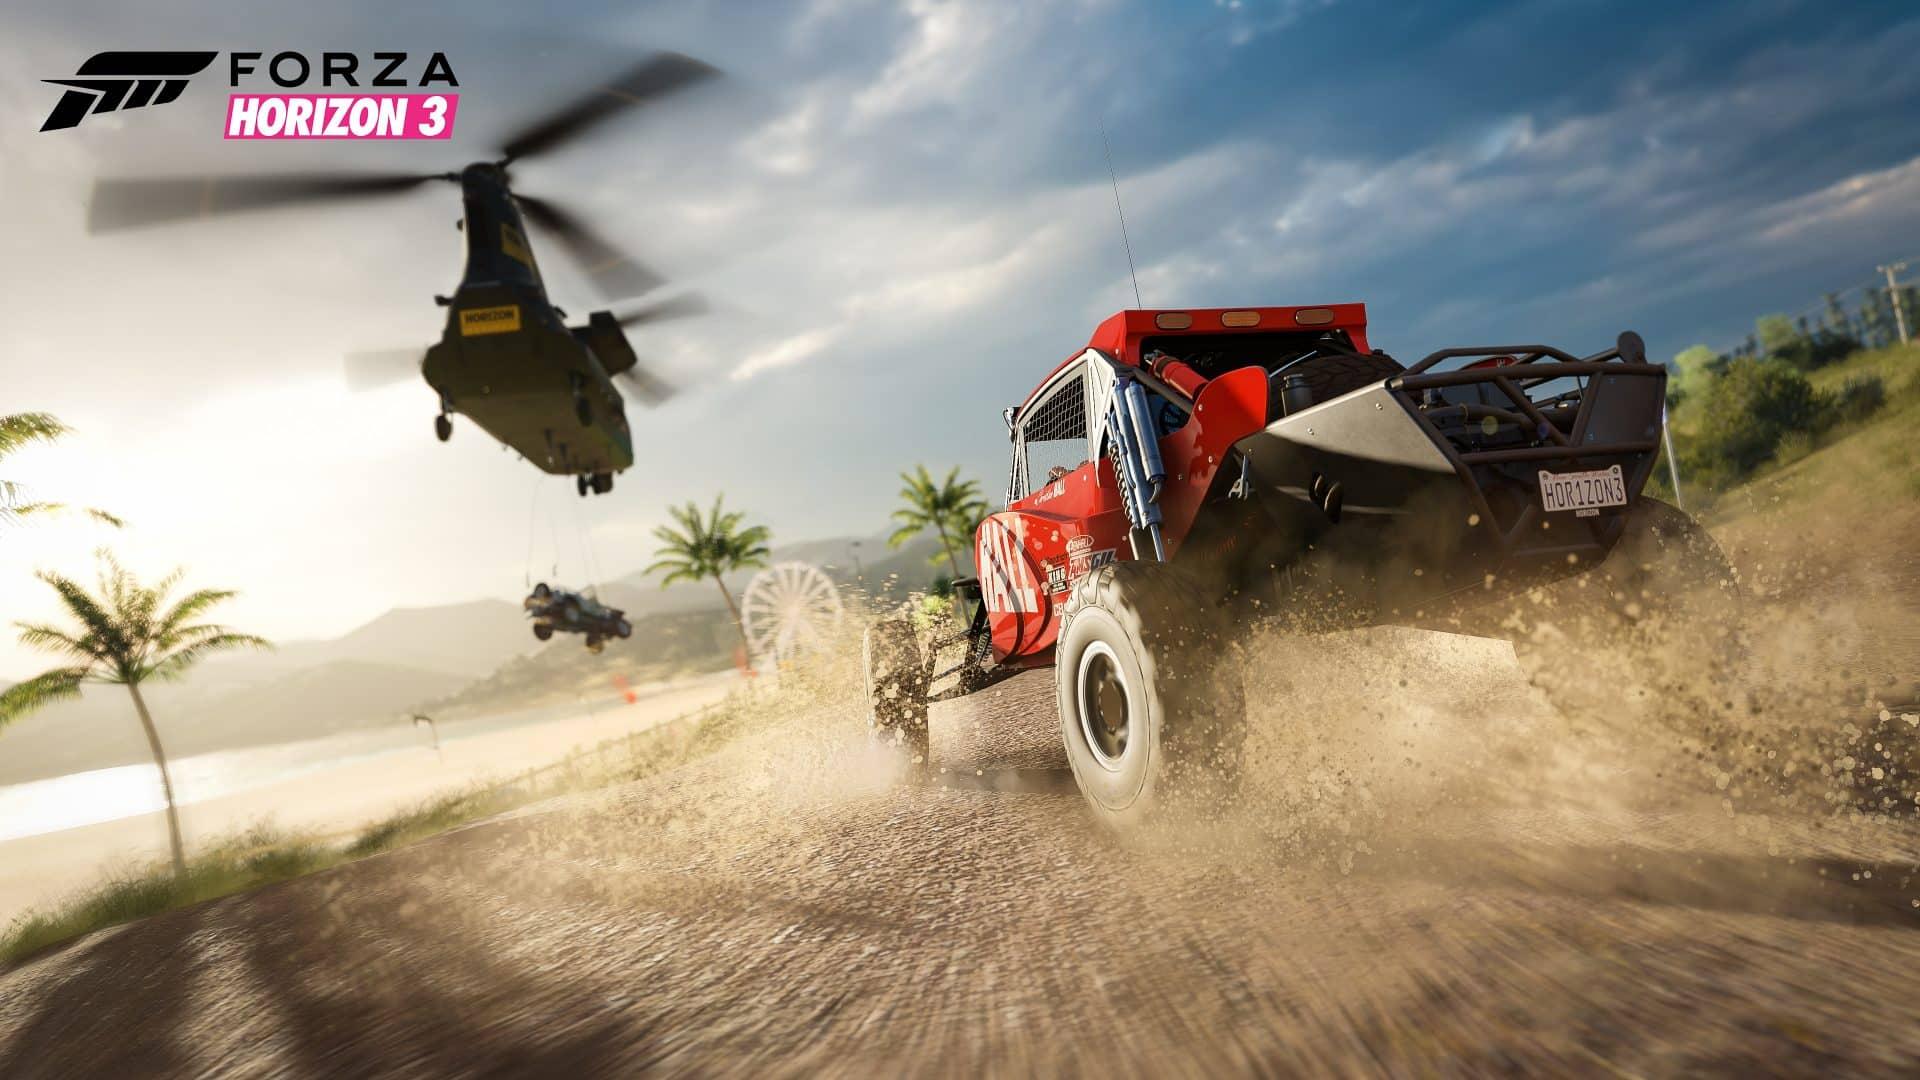 [Preview] Forza Horizon 3 touche l'horizon